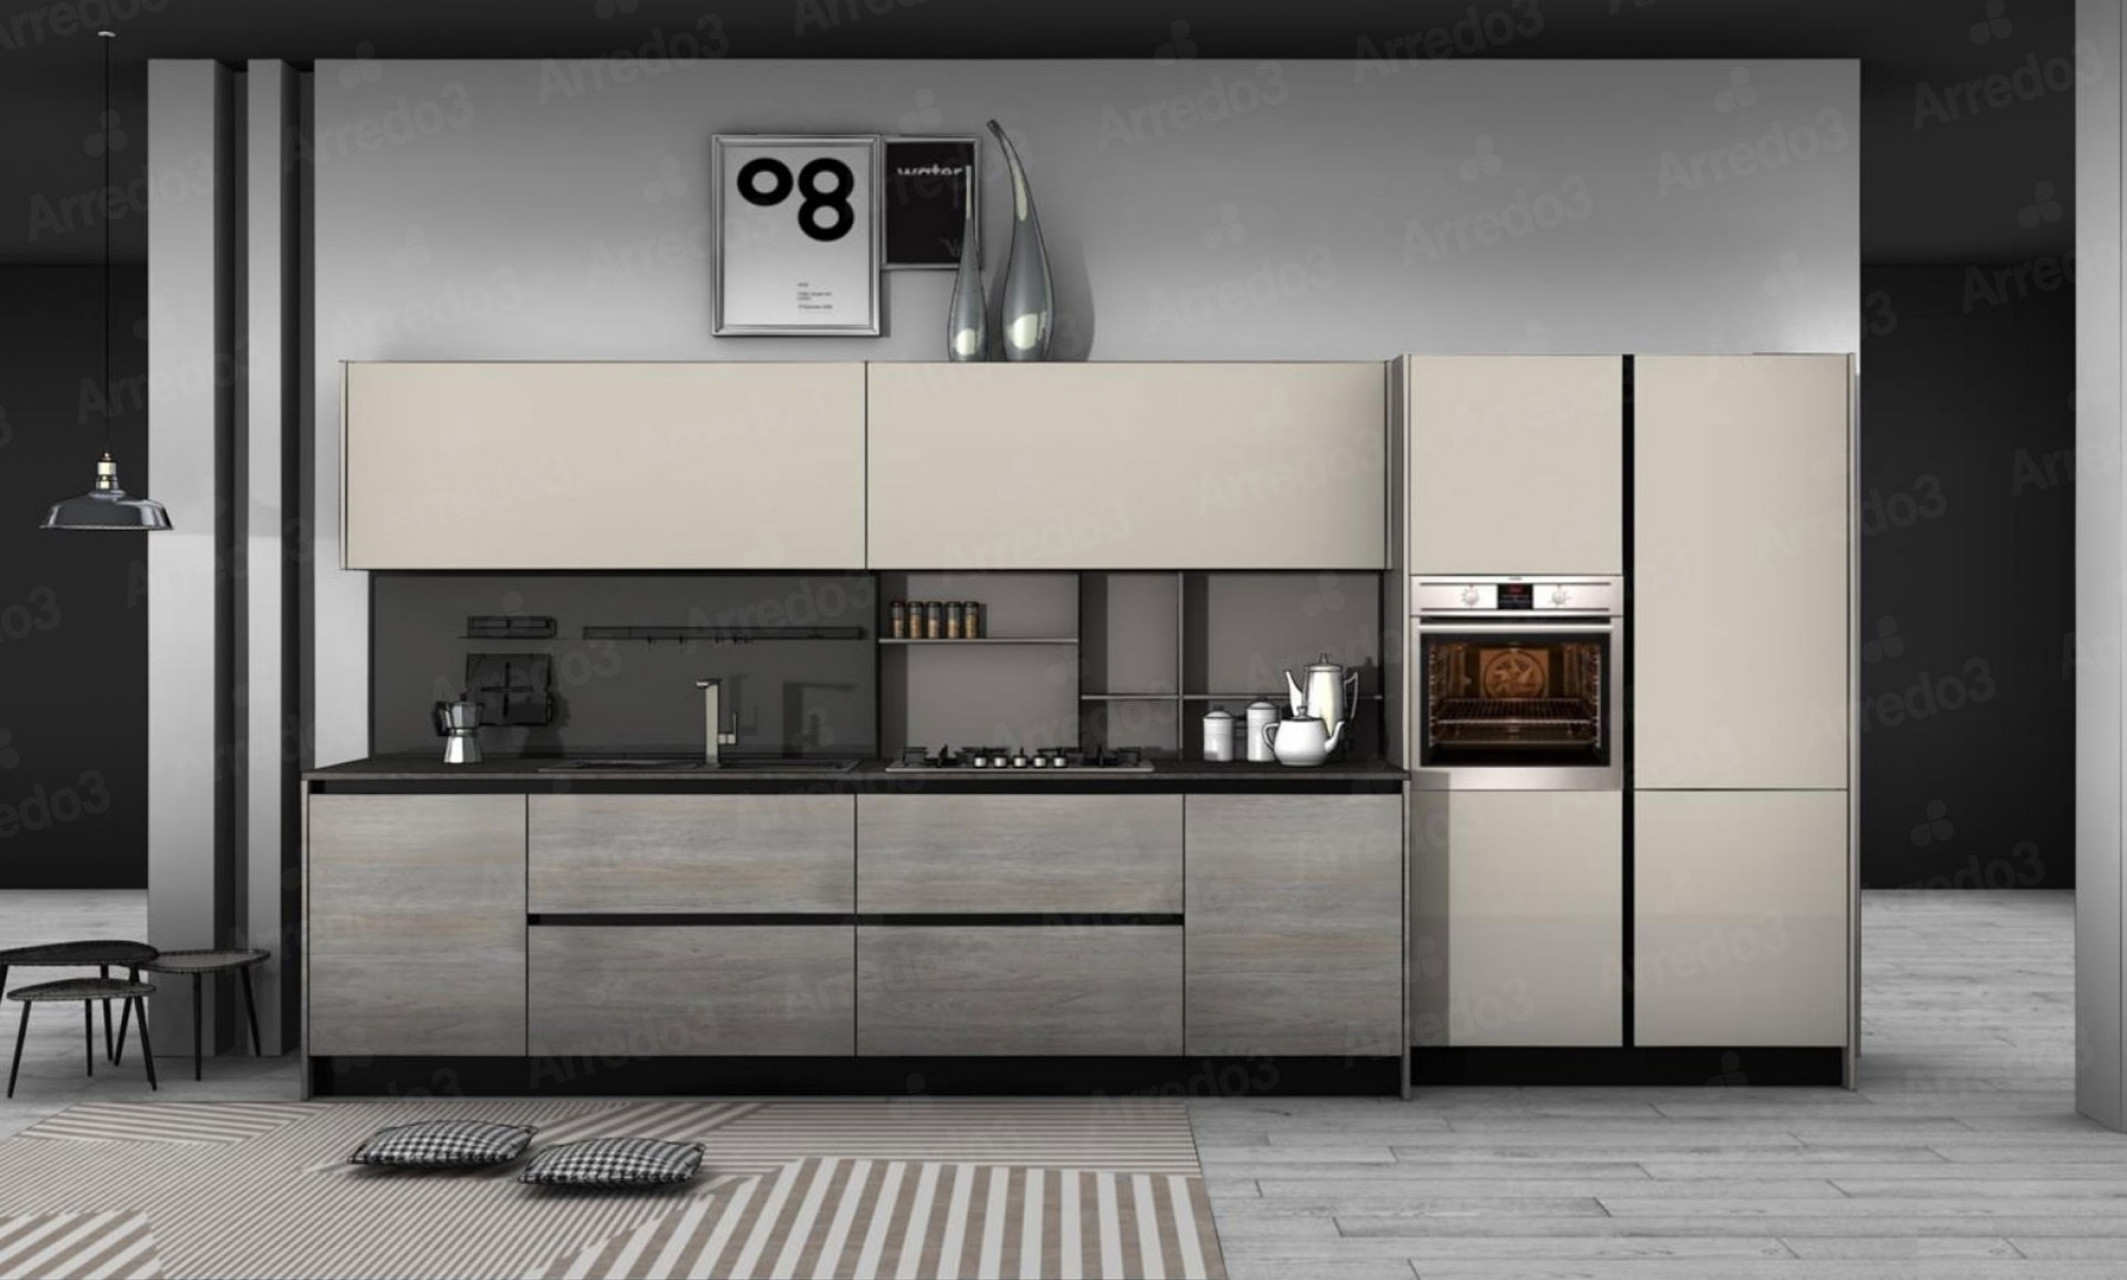 Итальянская Кухня CLOE LM20 | Цена на Кухня CLOE LM20 ARREDO3